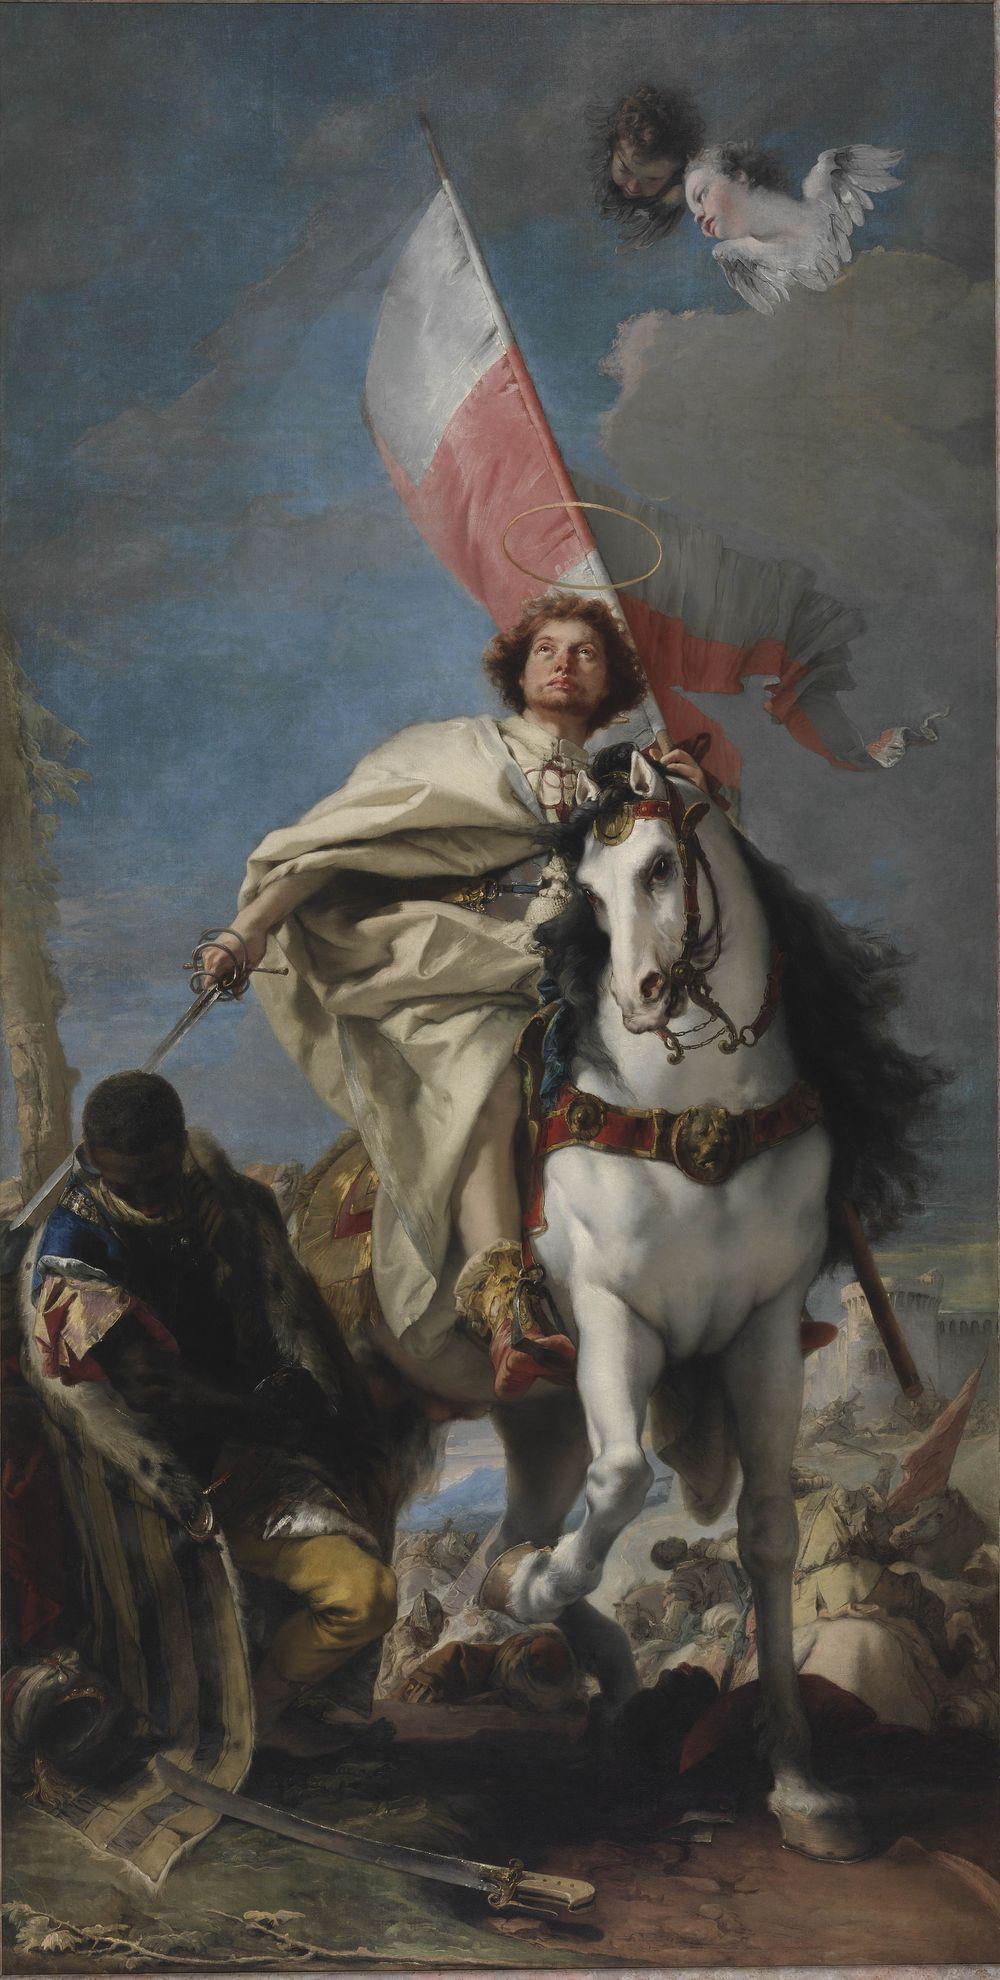 Giovanni Domenico Tiepolo. The Apparition of St. James at the Battle of Clavijo